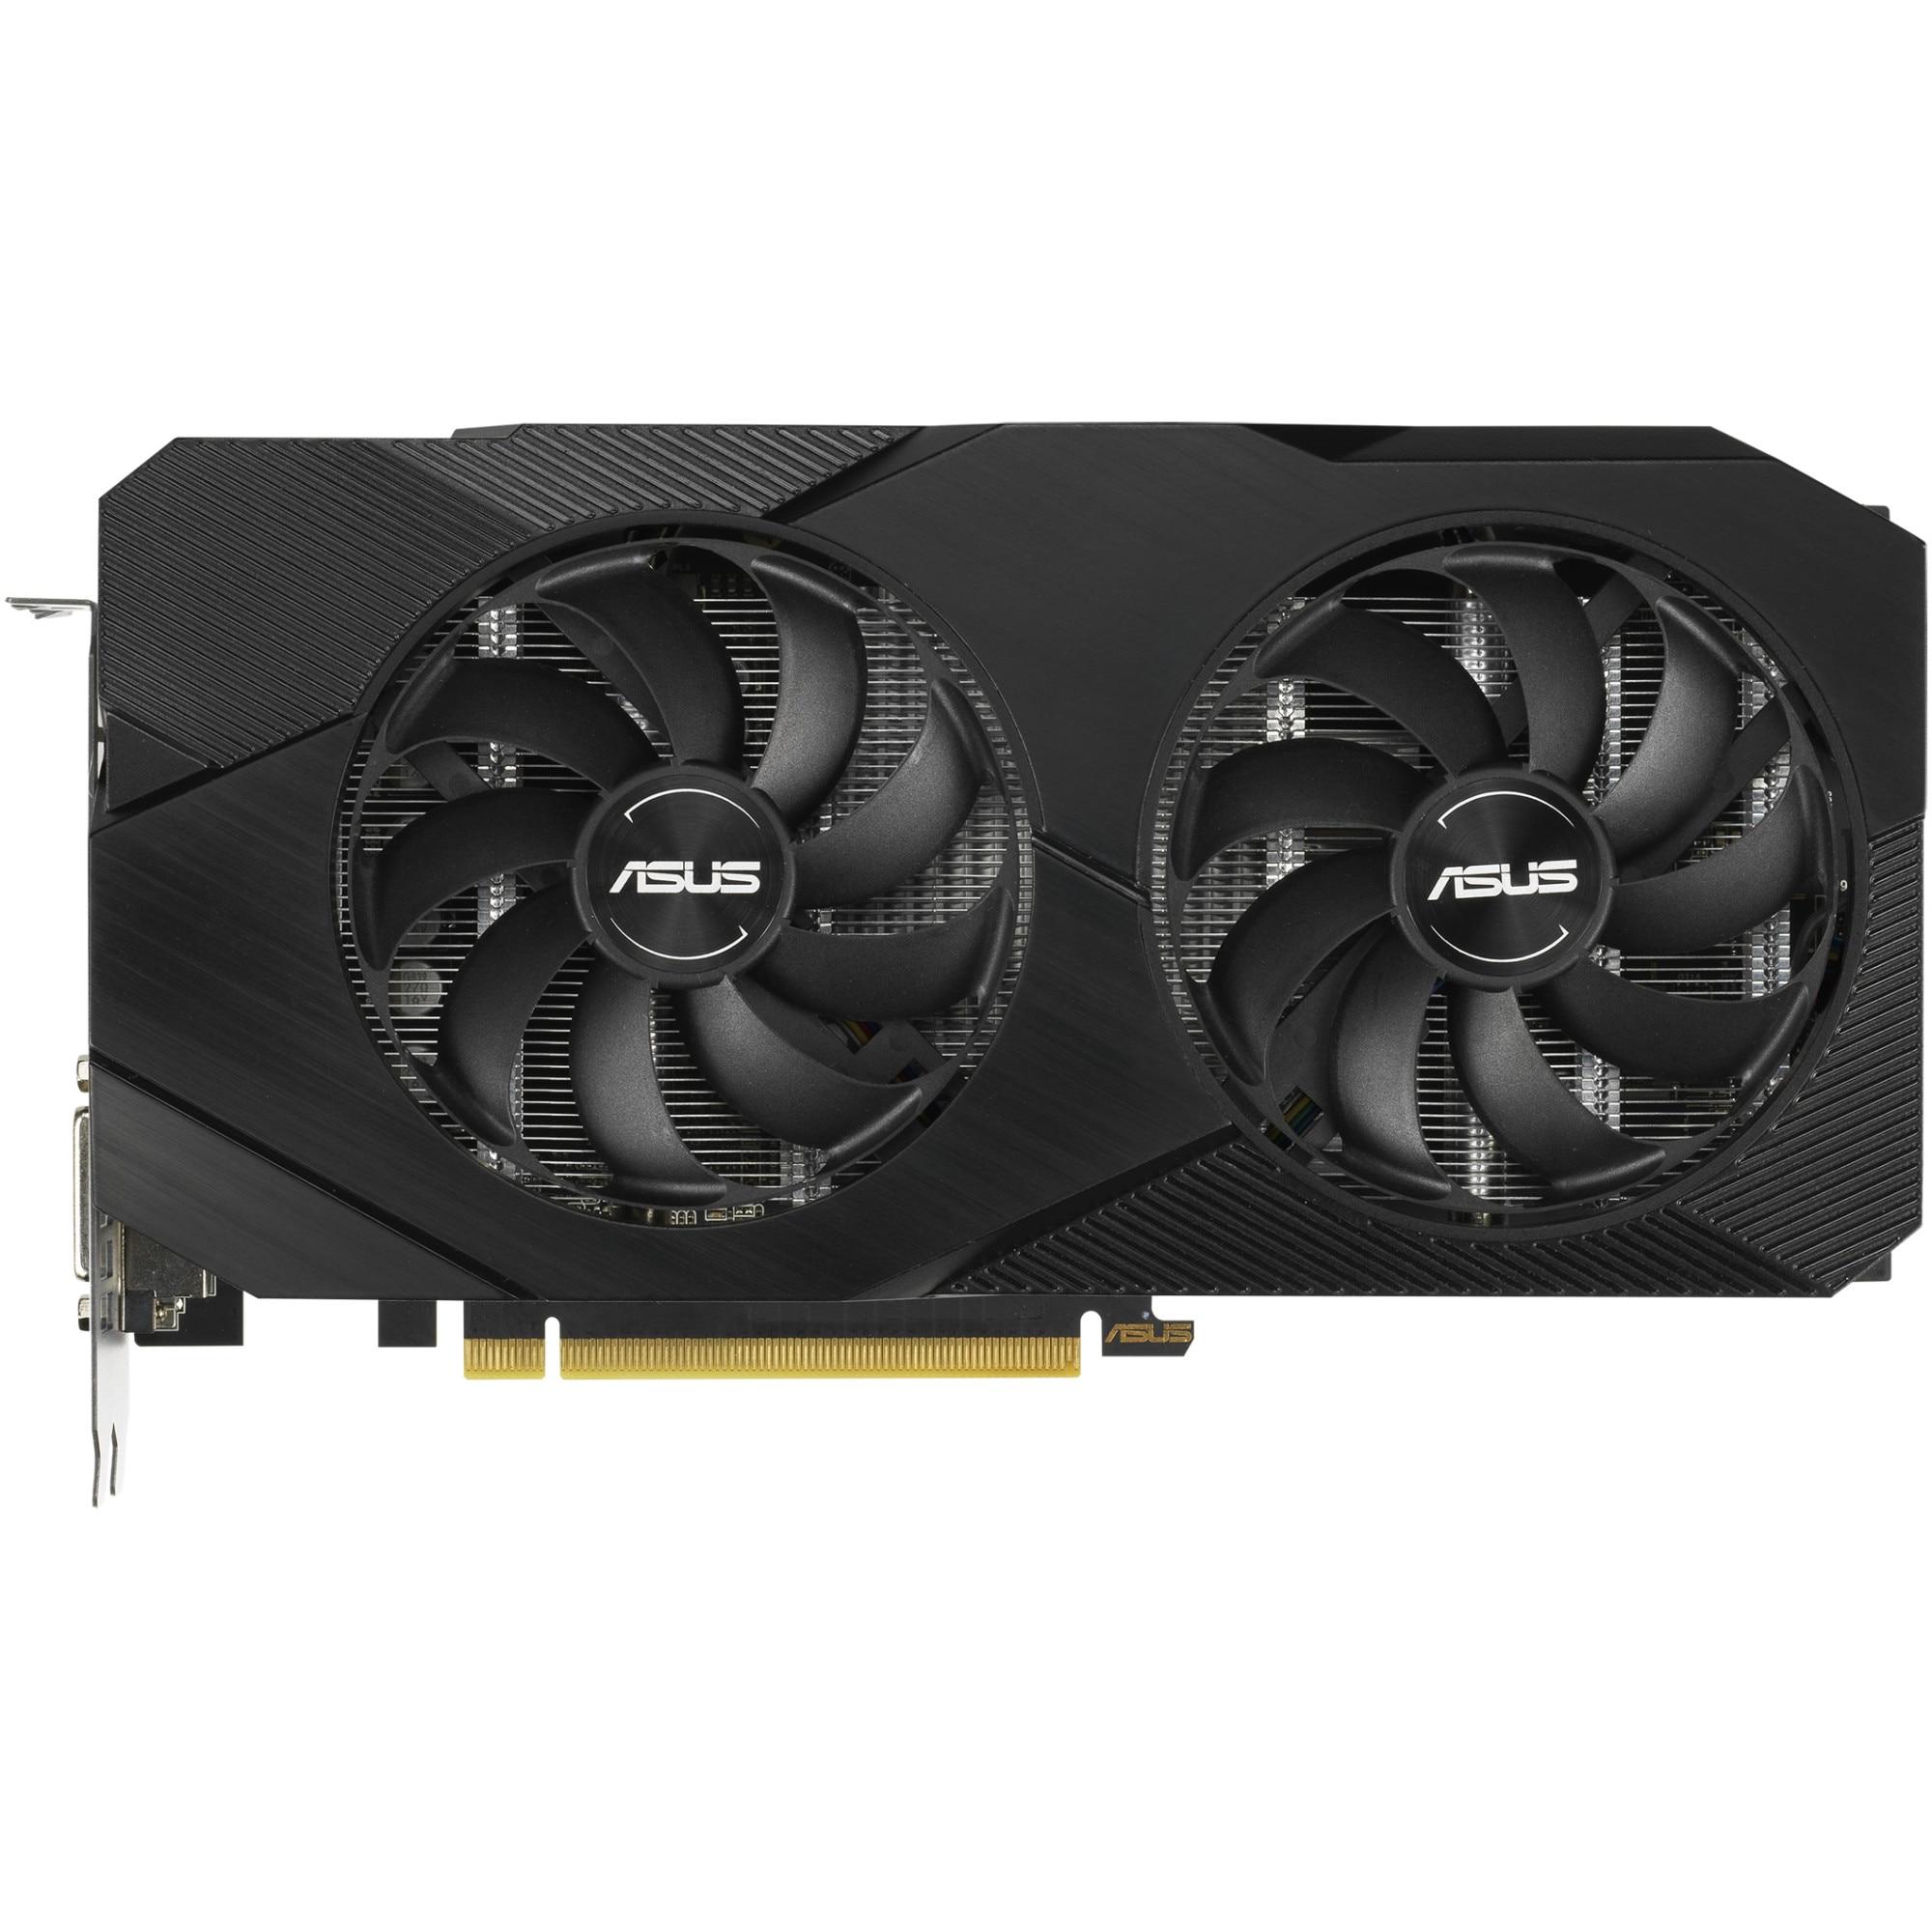 Fotografie Placa video Asus Dual GeForce® GTX 1660 SUPER™ OC Edition, 6GB, GDDR6, 192-bit